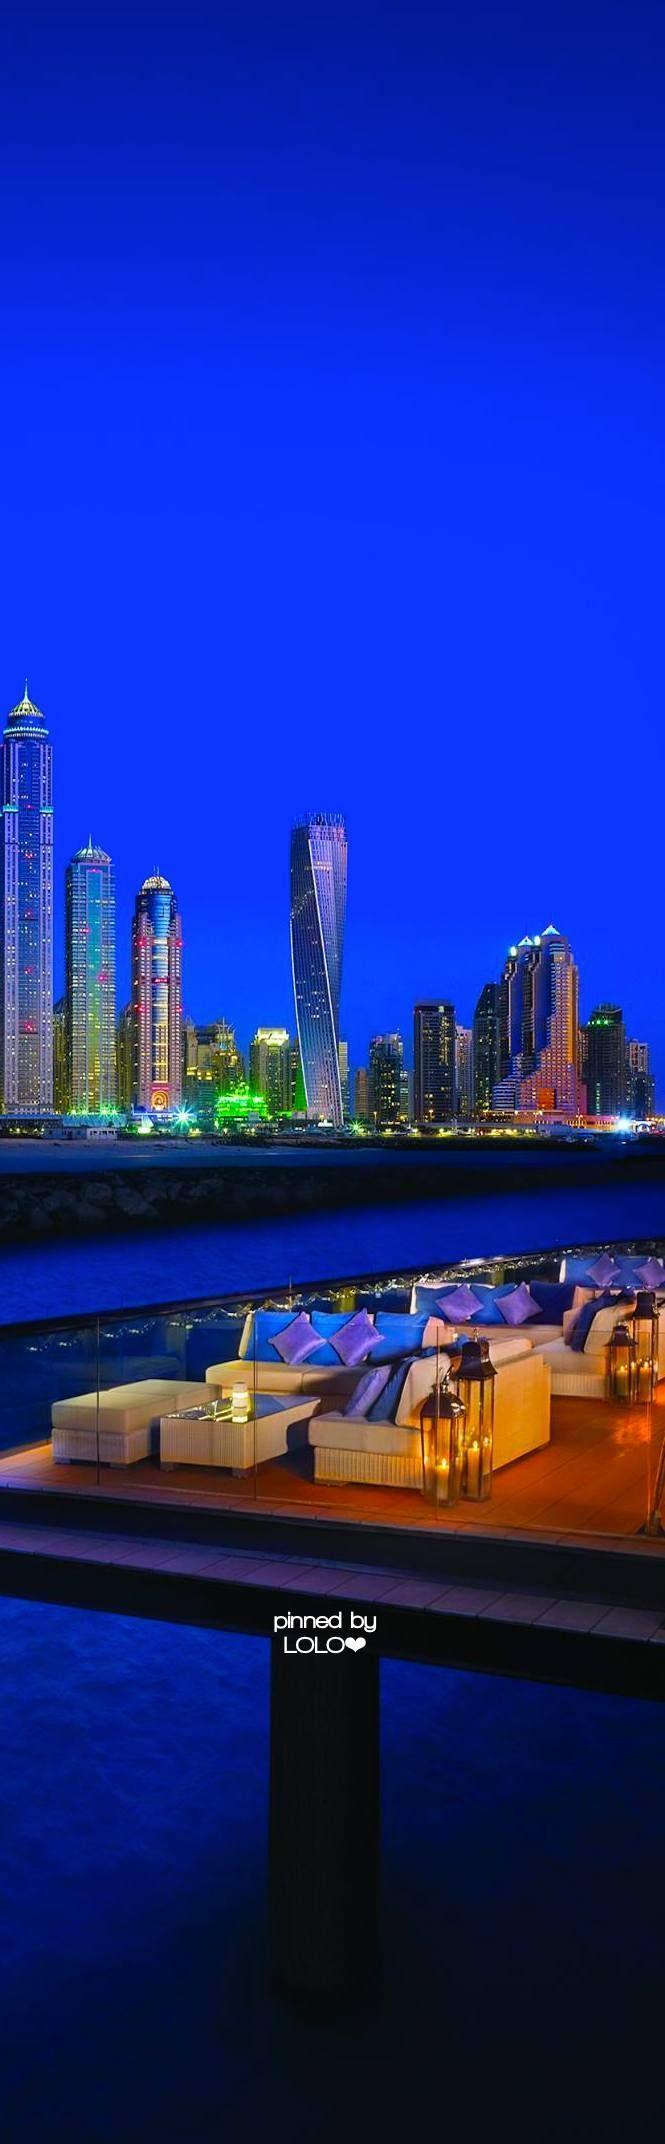 Parties   Illustration   Description   Dubai vacations : One&Only Dubai | LOLO    – Read More –